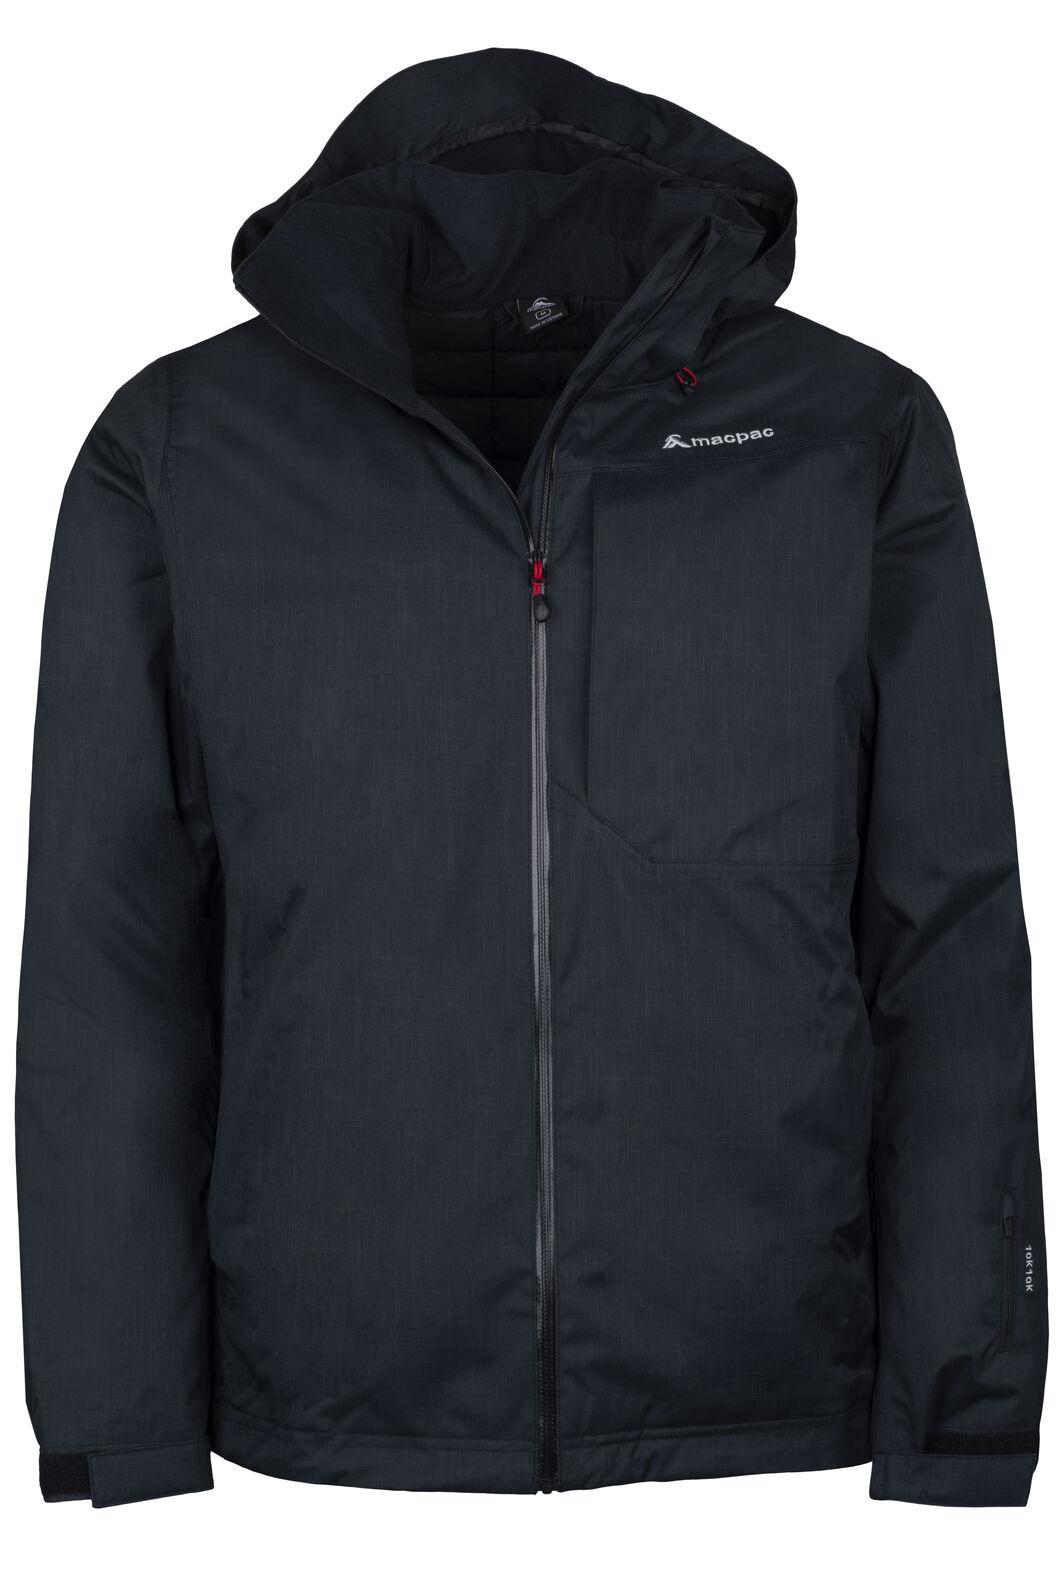 Macpac Powder Ski Jacket - Men s 1ee1ba5e6